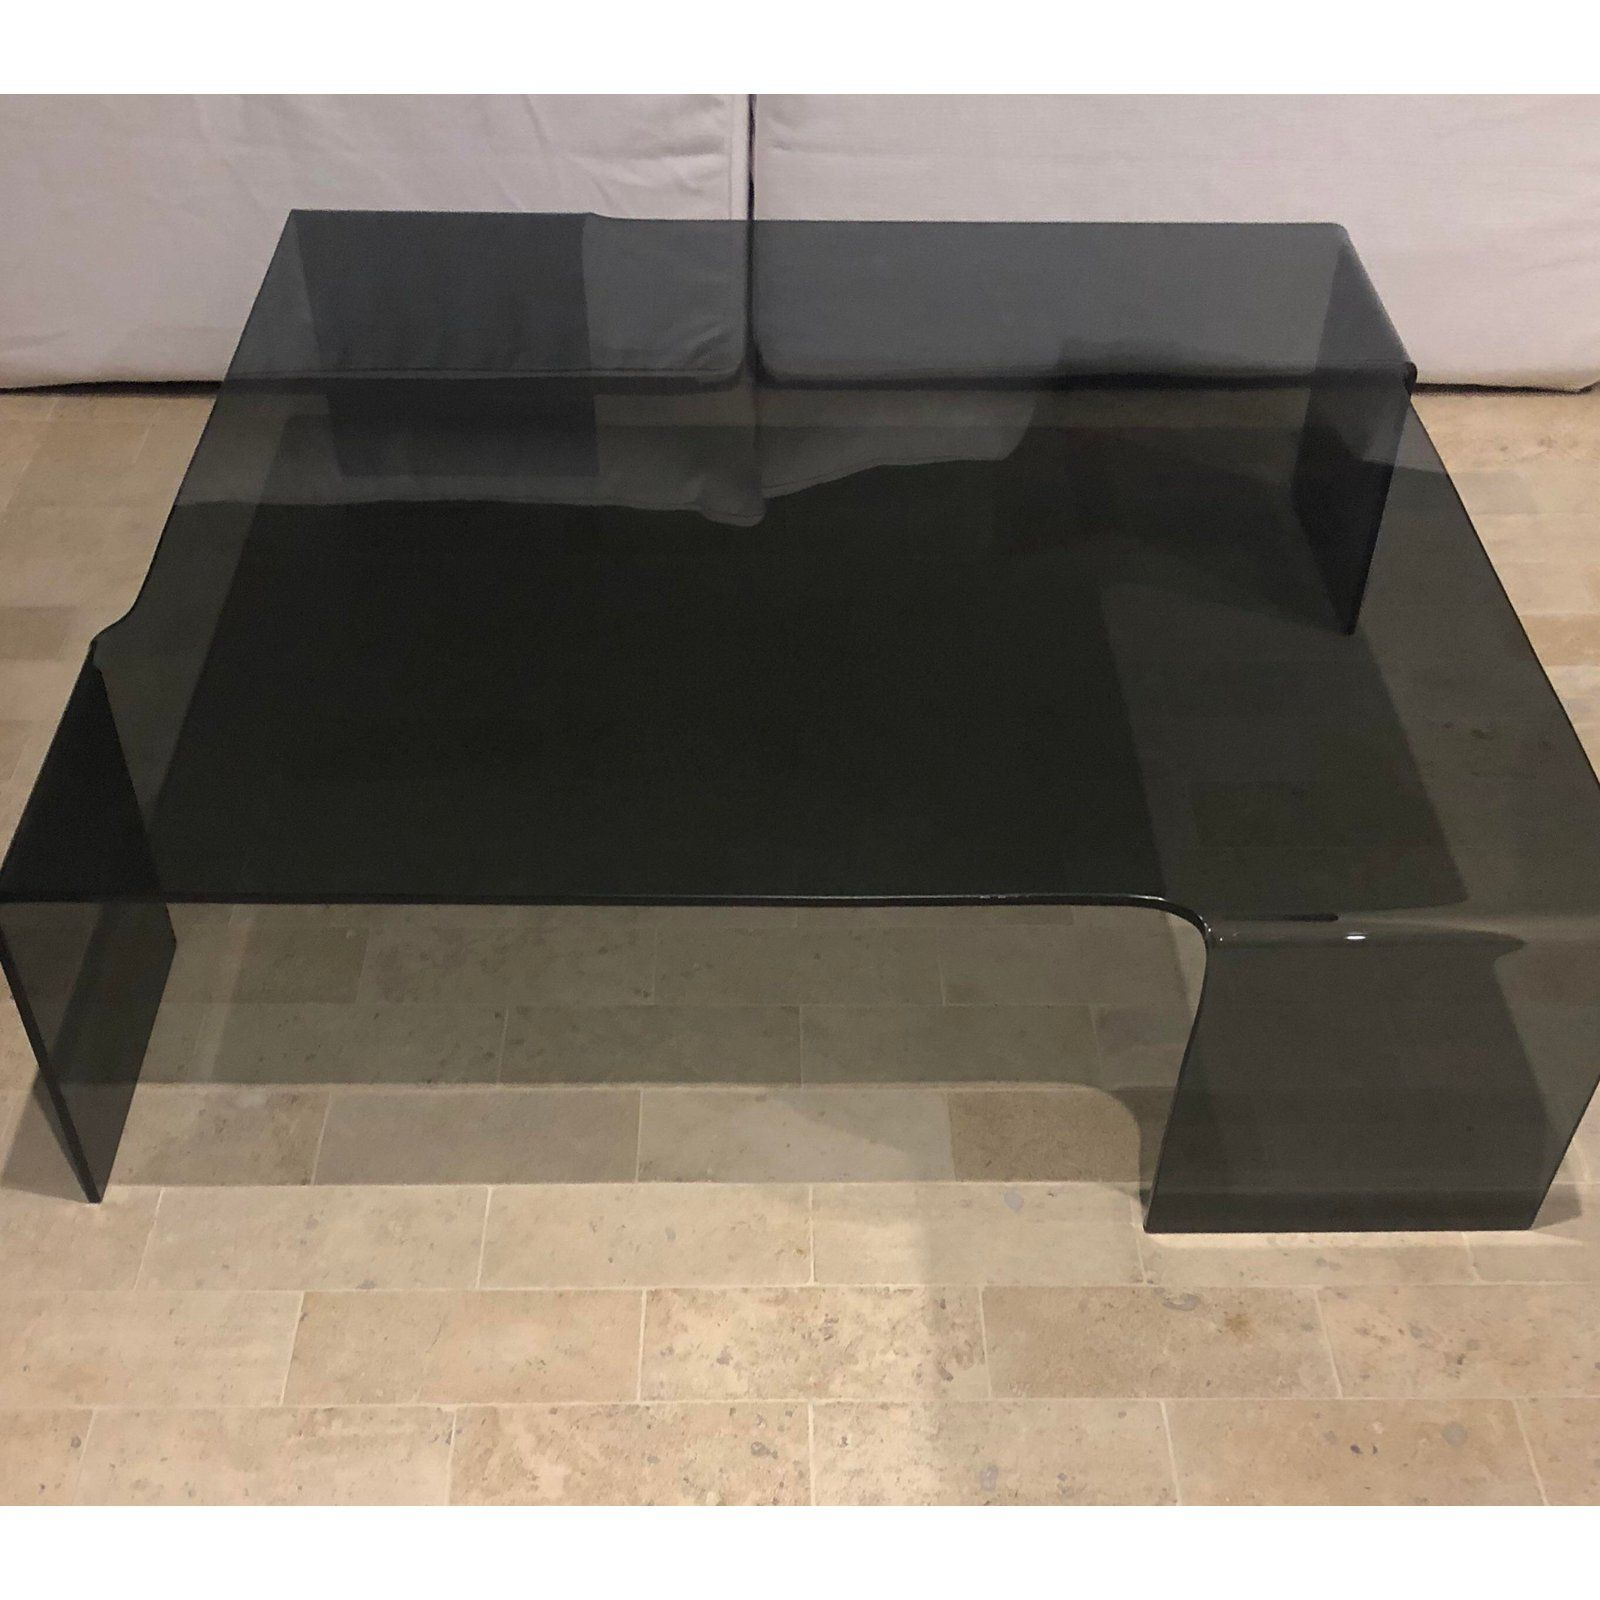 Modern Smoked Glass Coffee Table Chairish Coffee Table Glass Coffee Table Smoked Glass